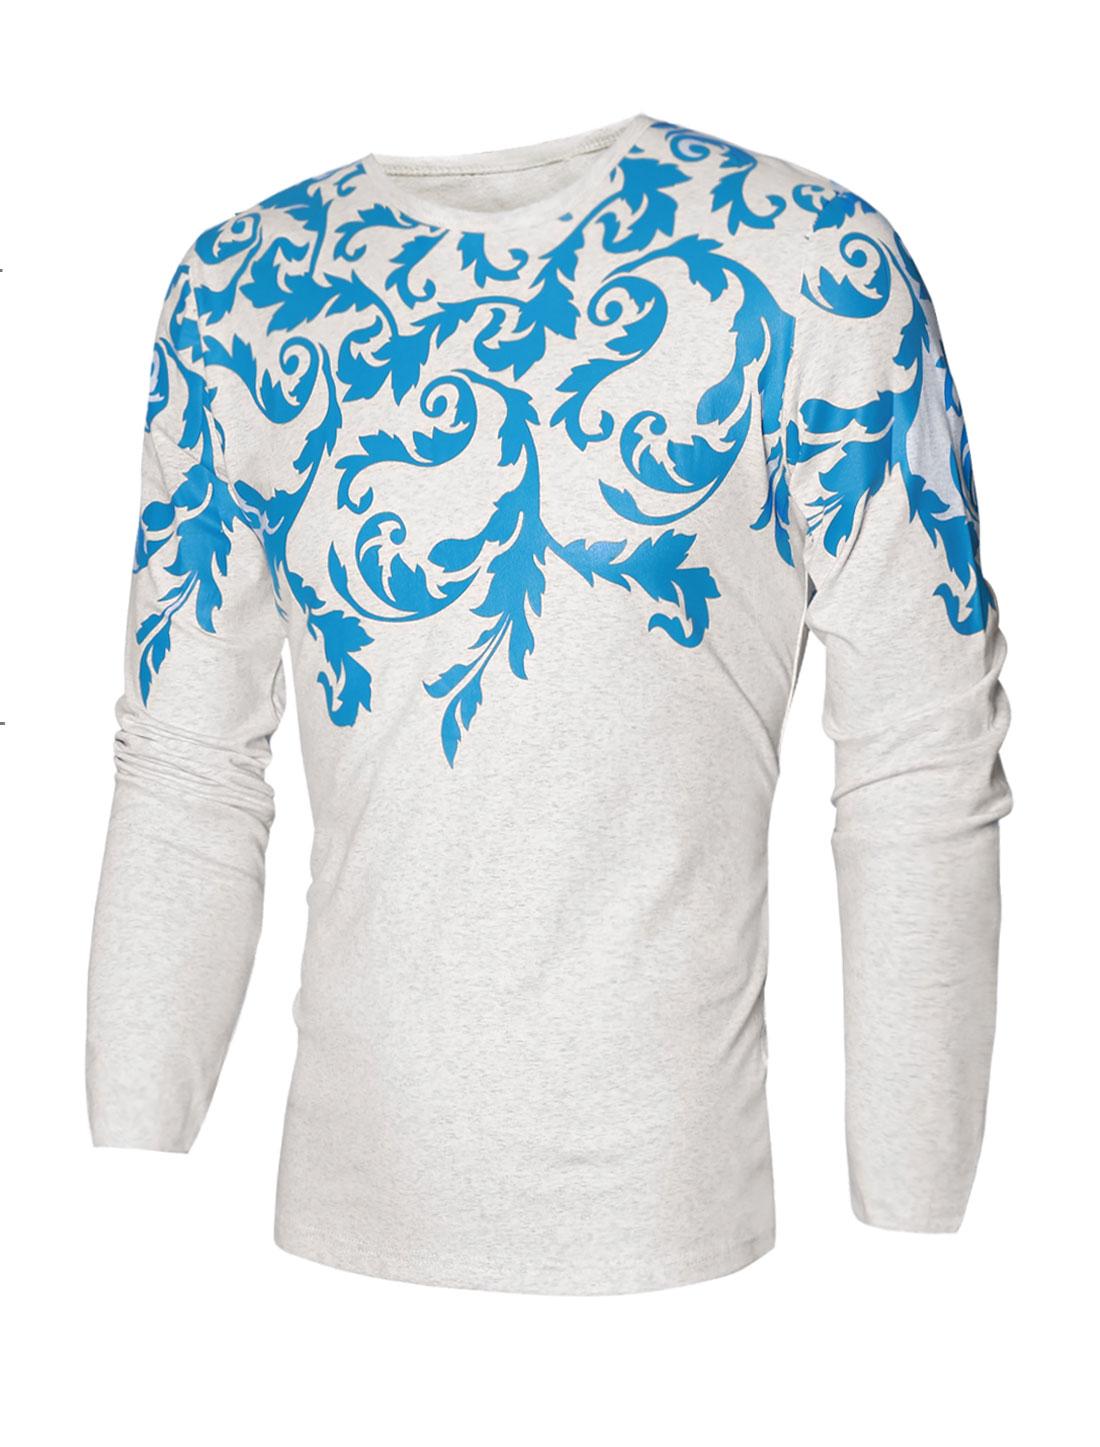 Men Crew Neck Slim Fit Plants Print Tee Shirt Gray M